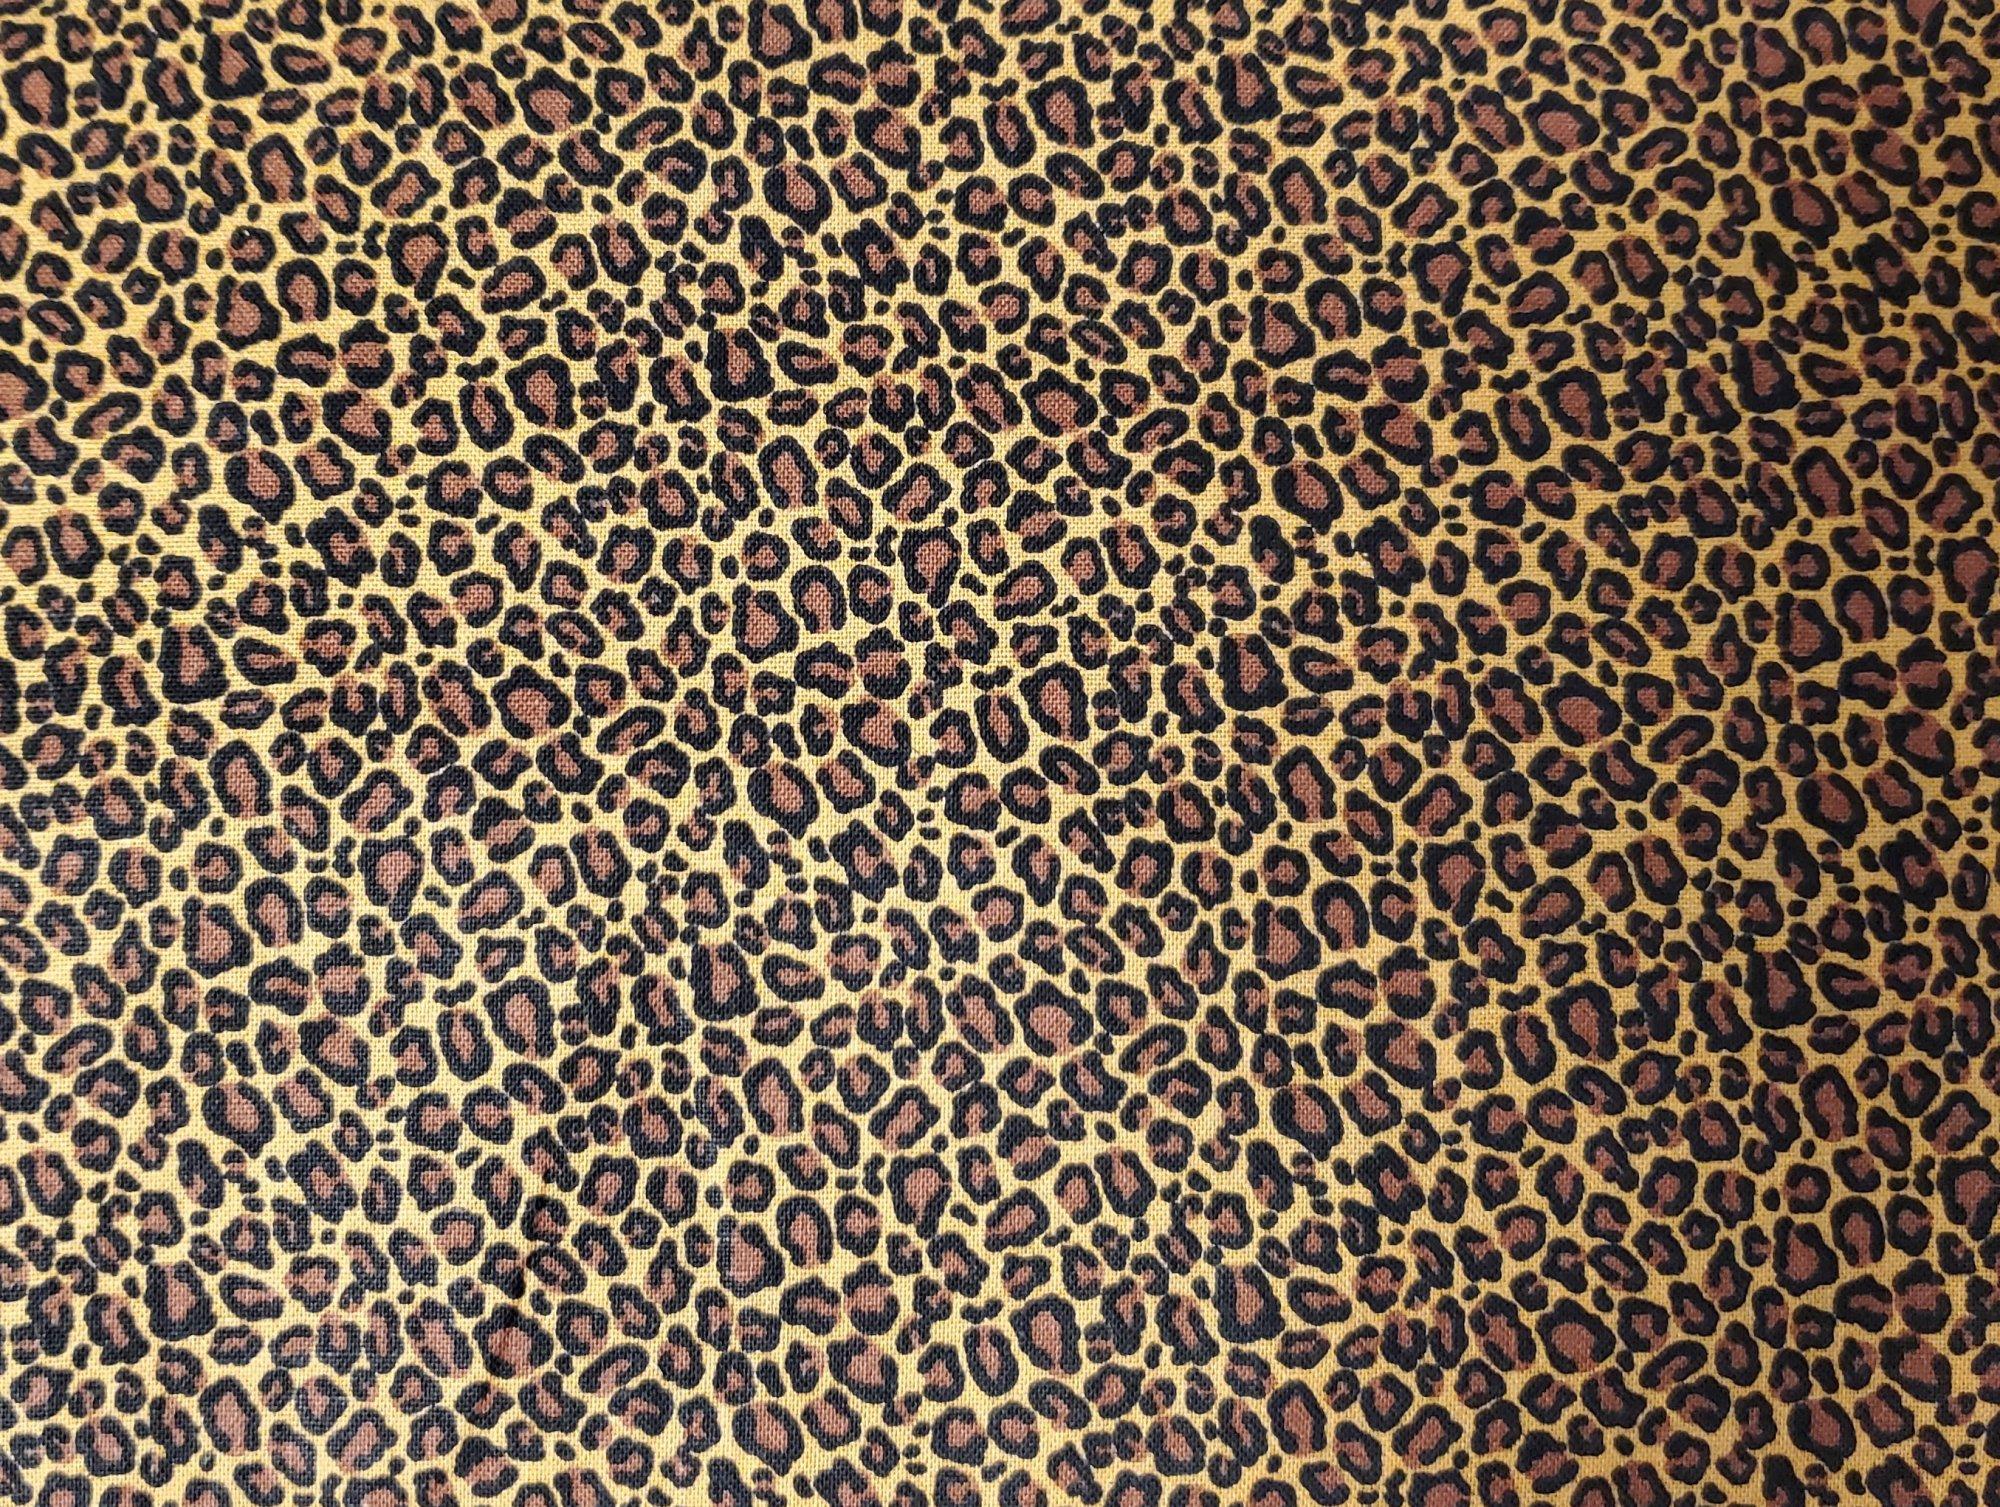 Animal Print #8 - Small jaguar print (?)